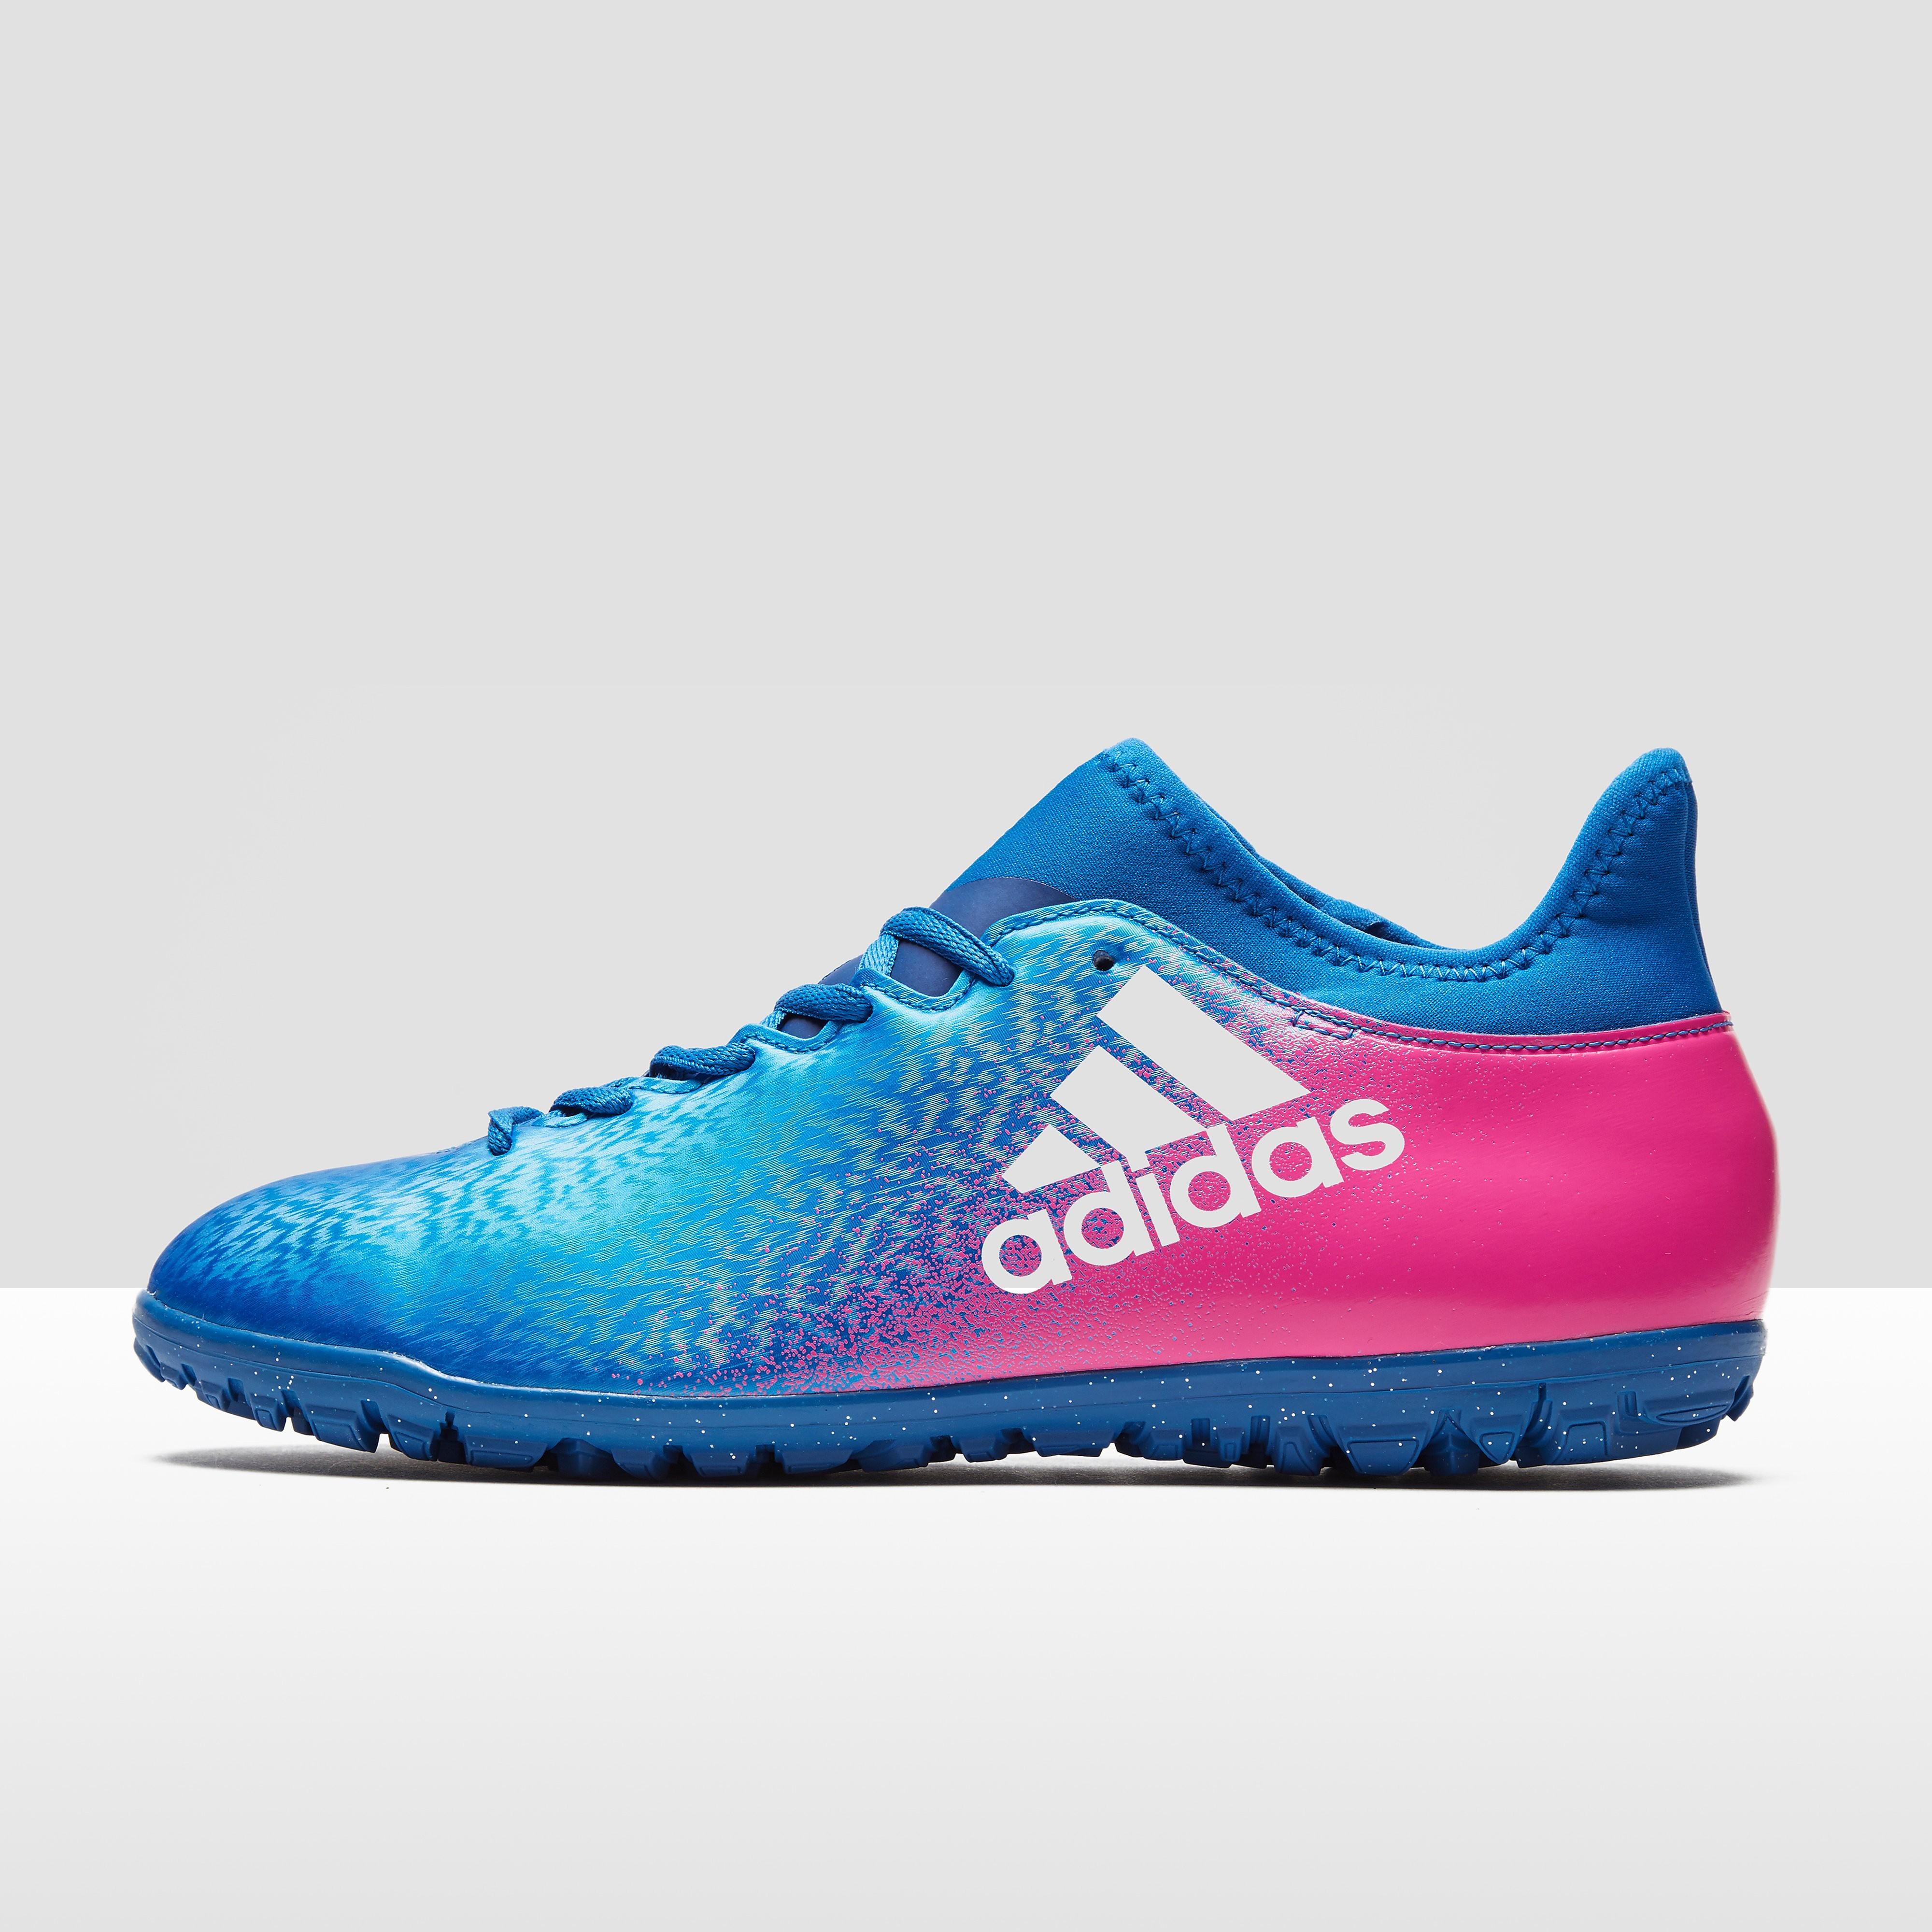 adidas Blue Blast X 16.3 Turf Men's Football Boots